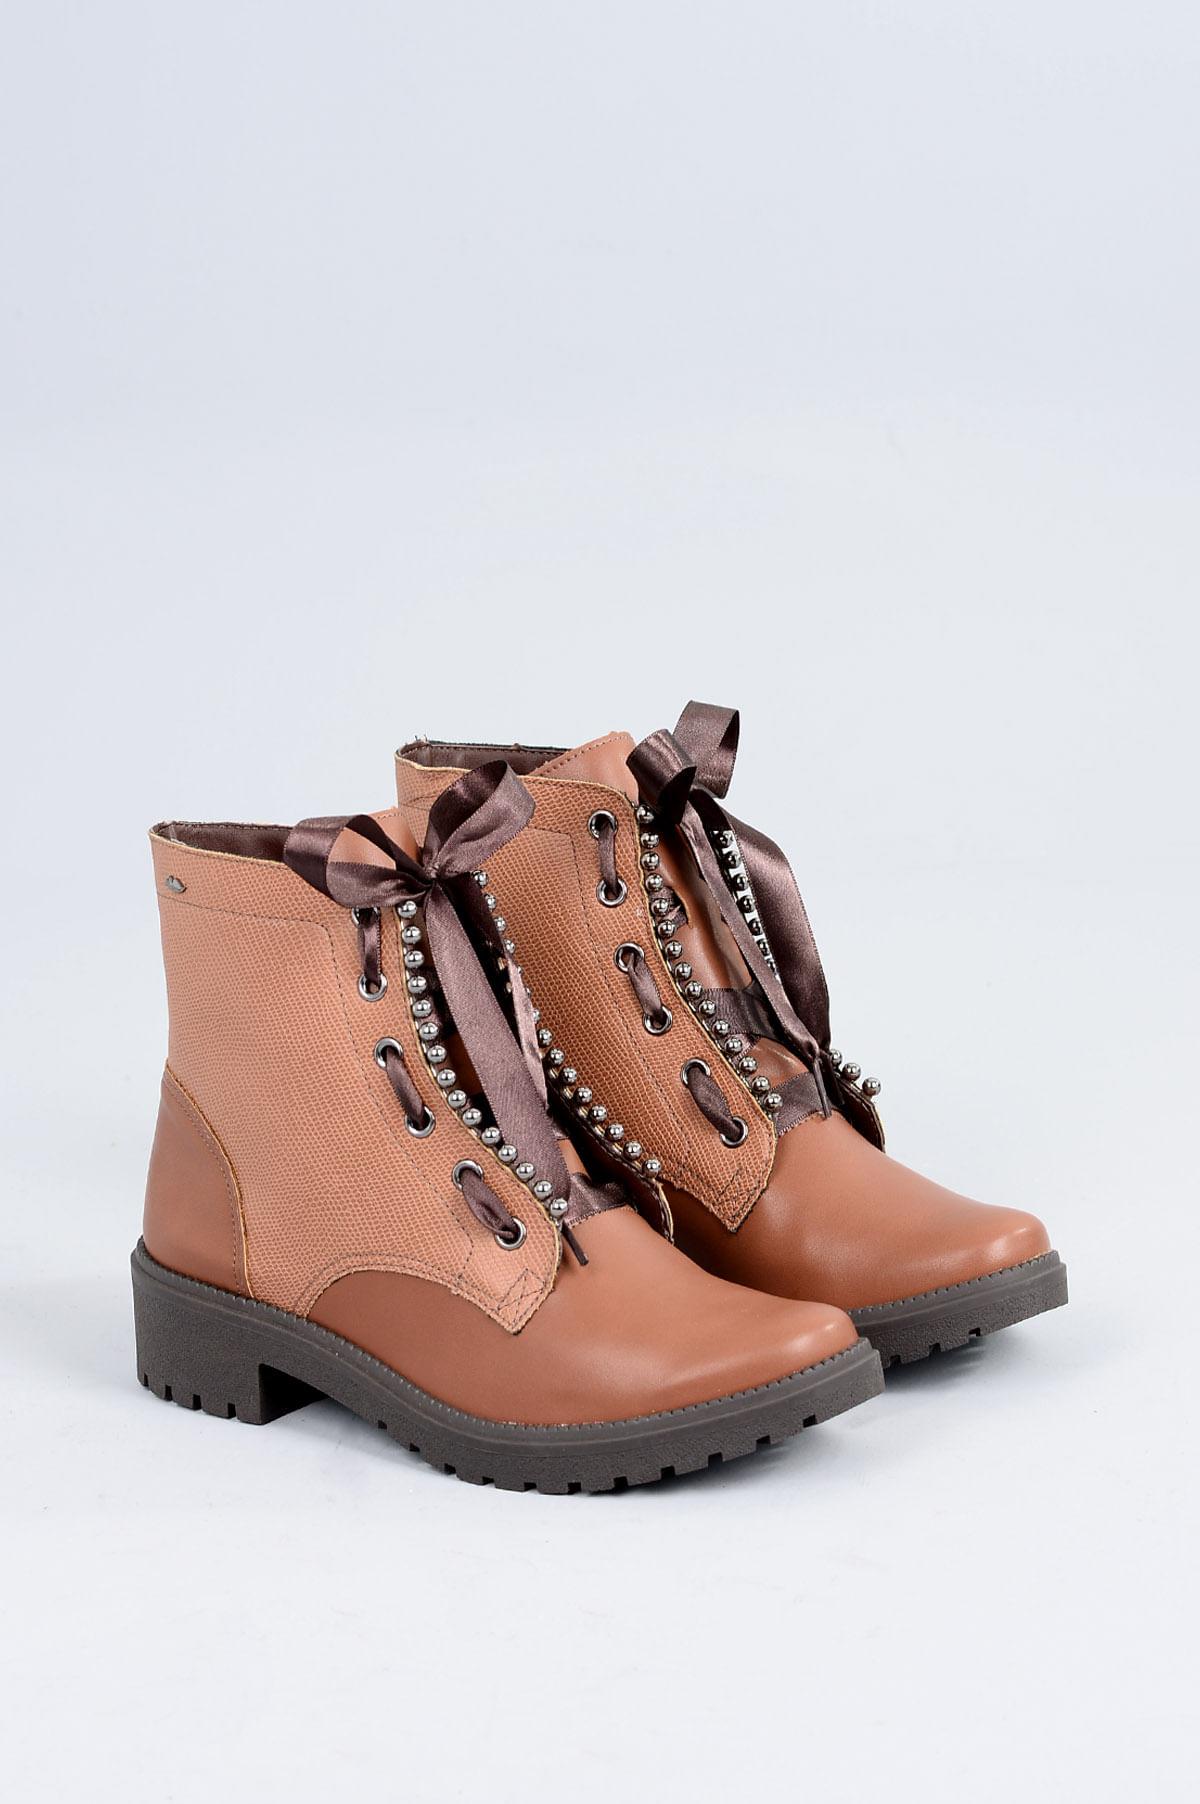 7e676aa653 Bota Coturno Telmy Dakota SINT - WHISKY - Mundial Calçados